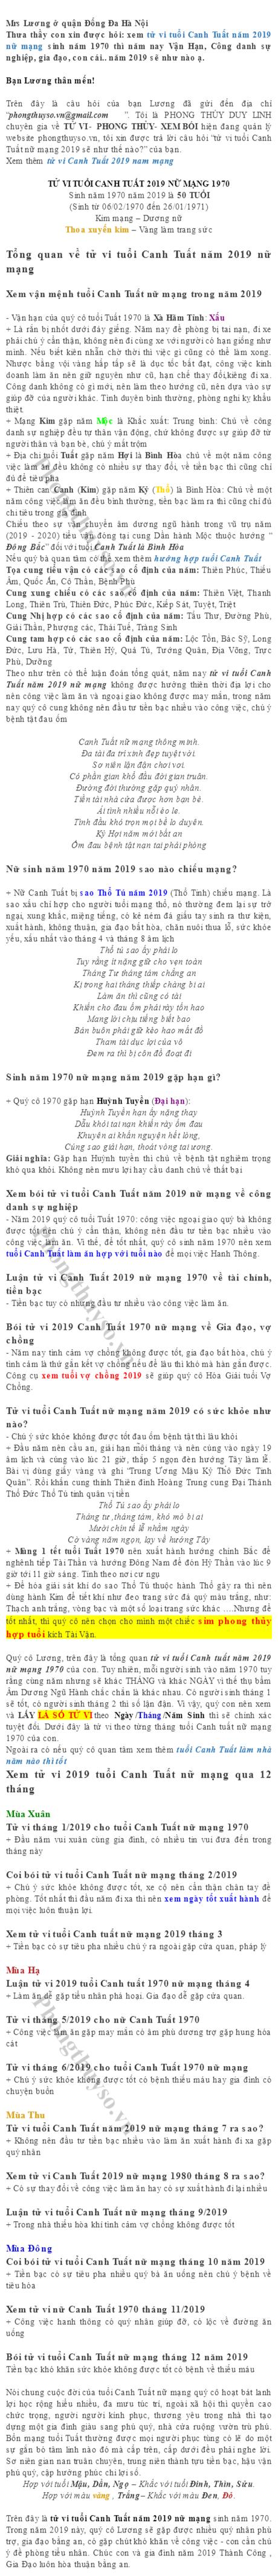 tu-vi-tuoi-canh-tuat-nam-2019-nu-mang